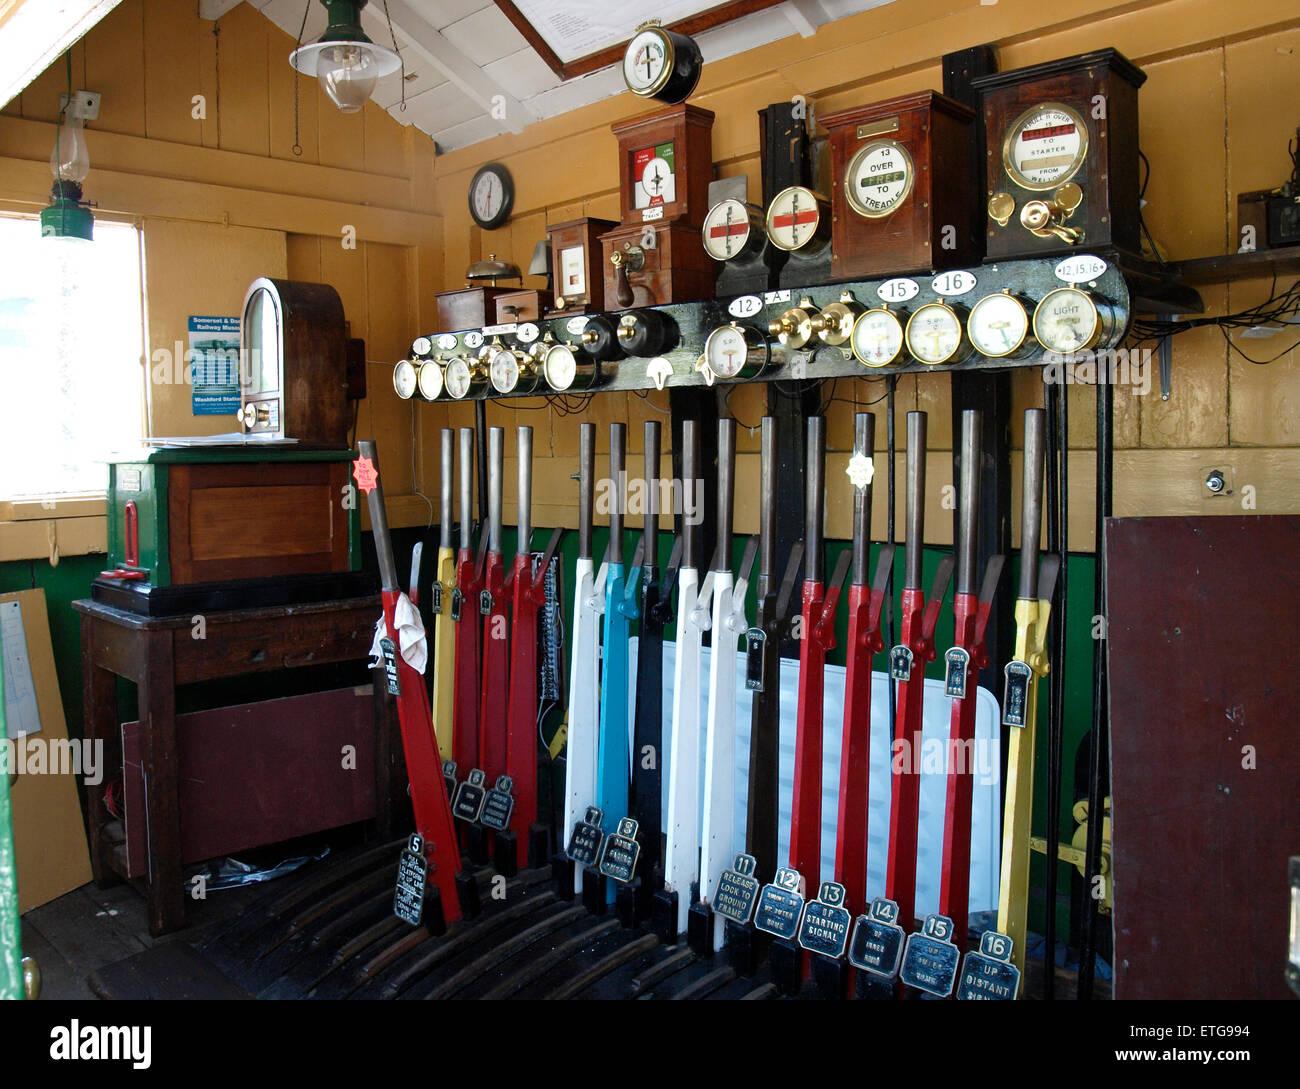 Levers inside original signal box, Washford Station, part of the West Somerset heritage railway, Somerset, UK - Stock Image